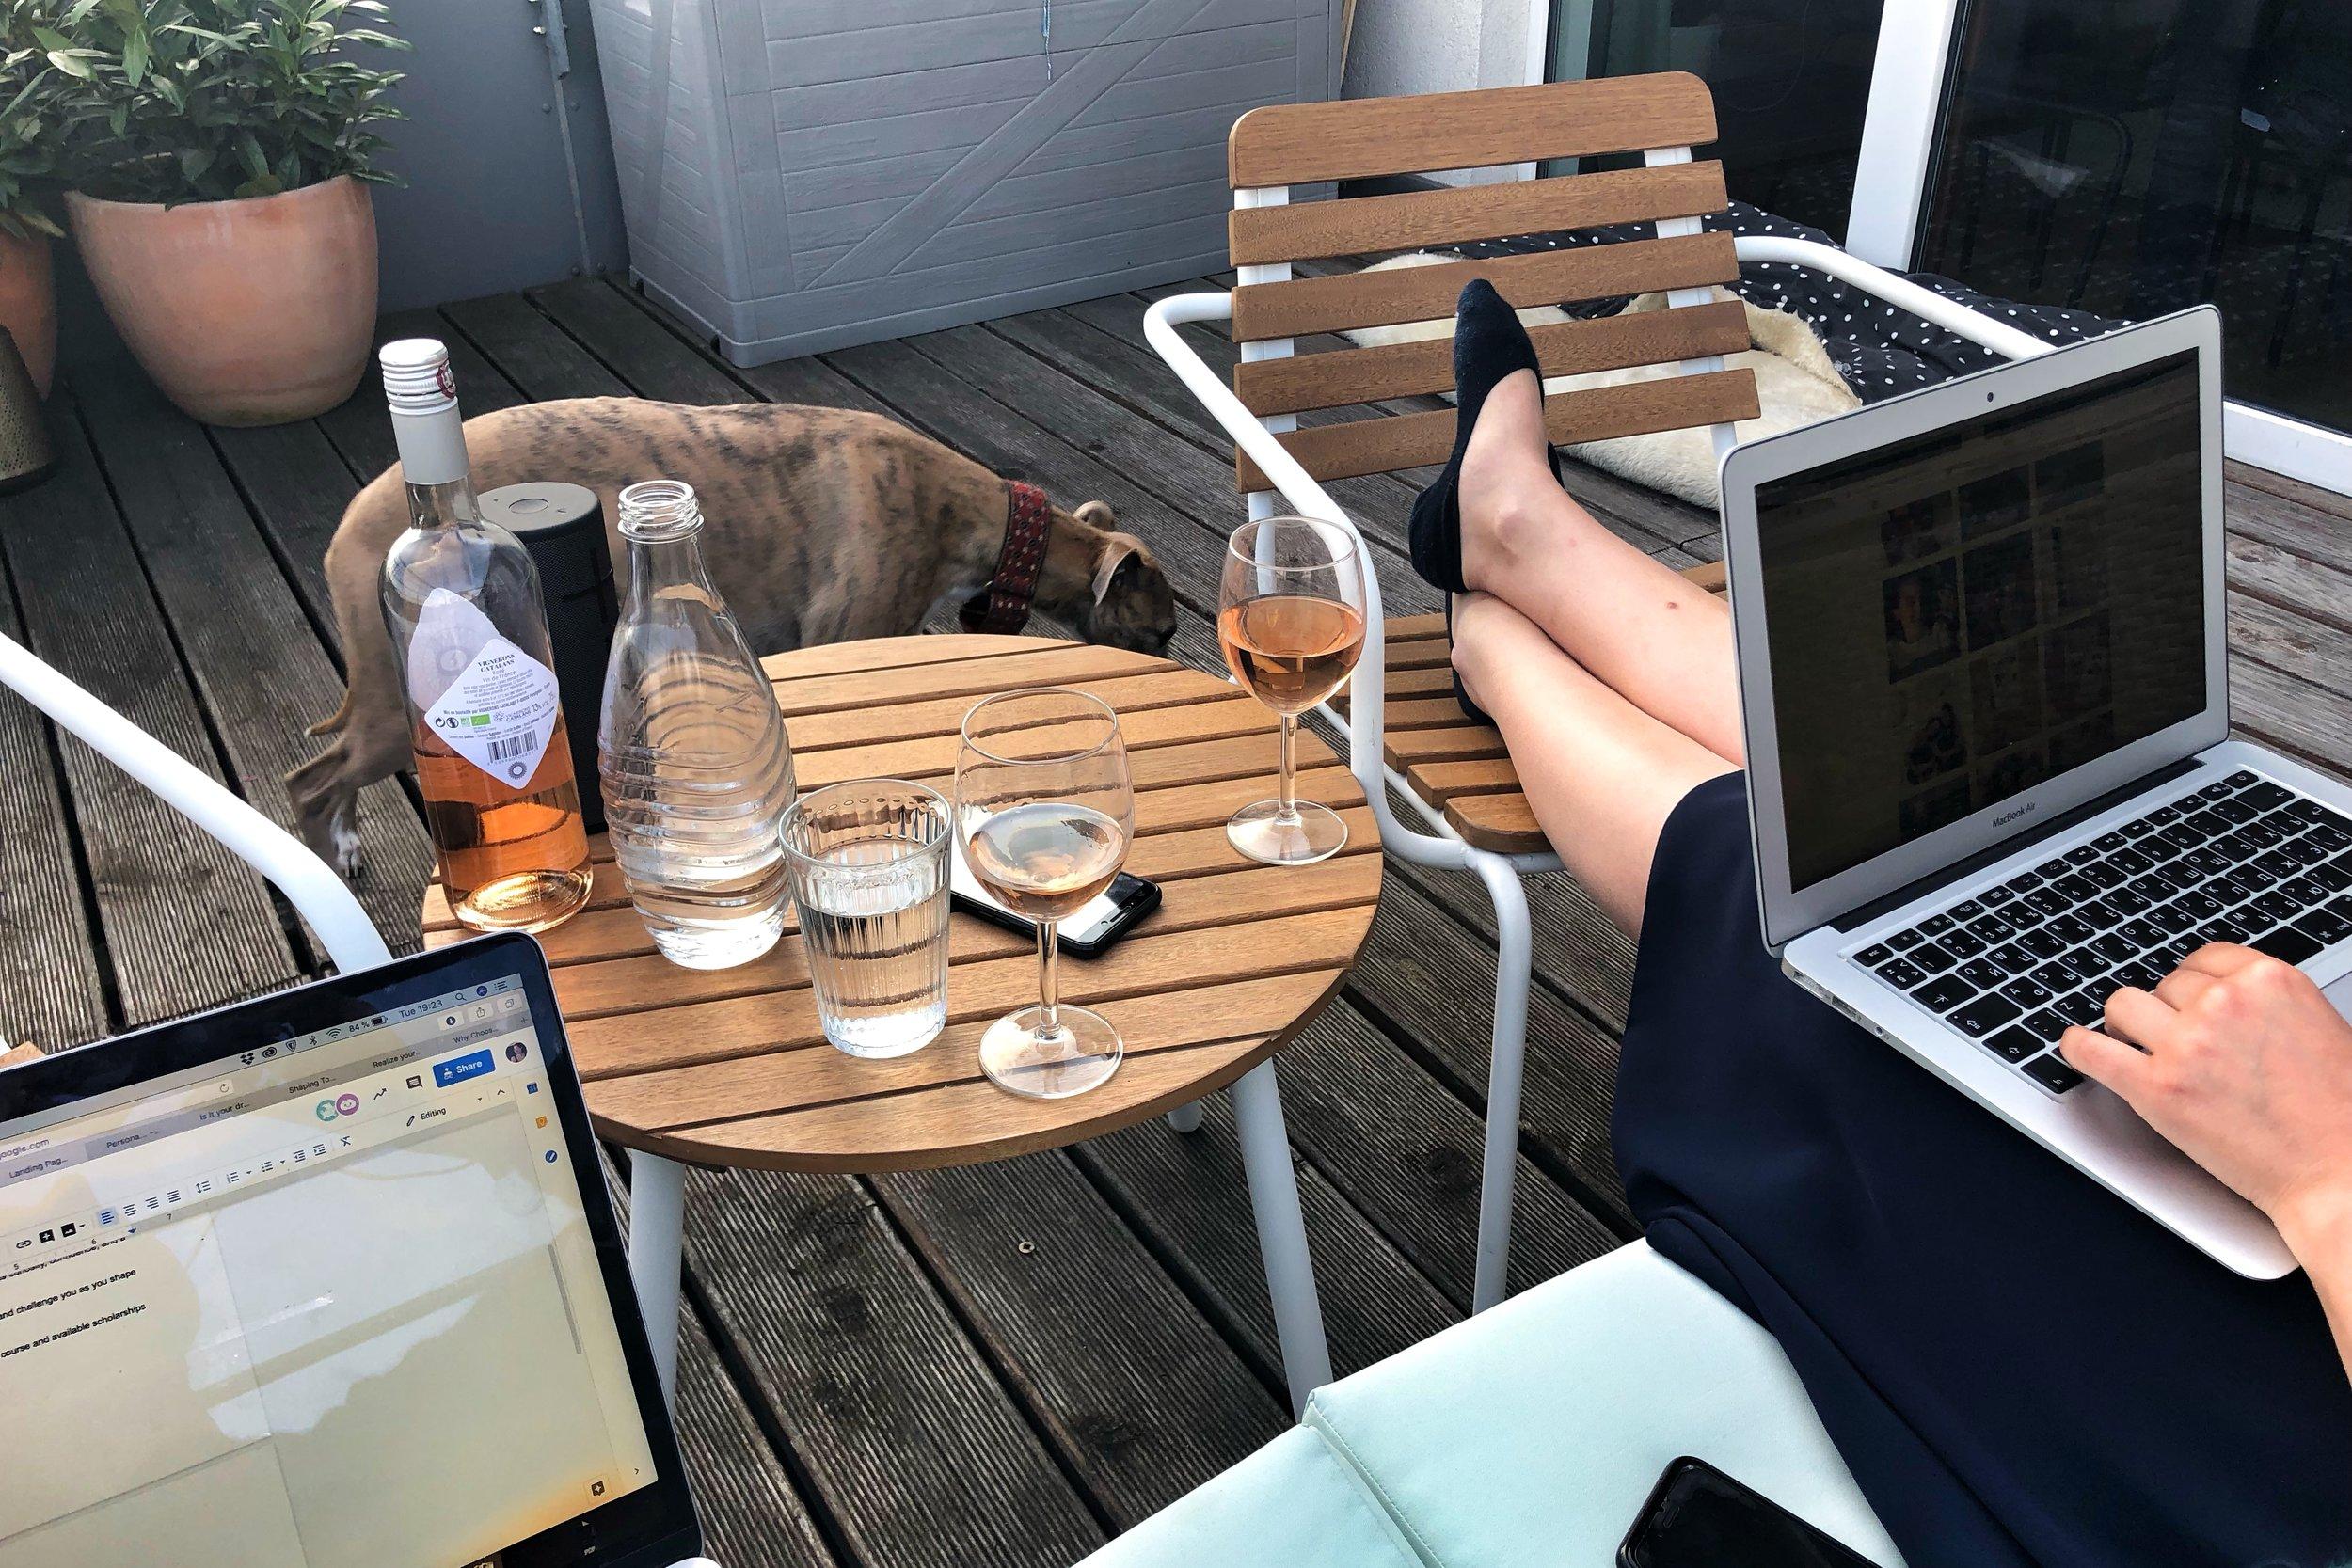 freelance_life